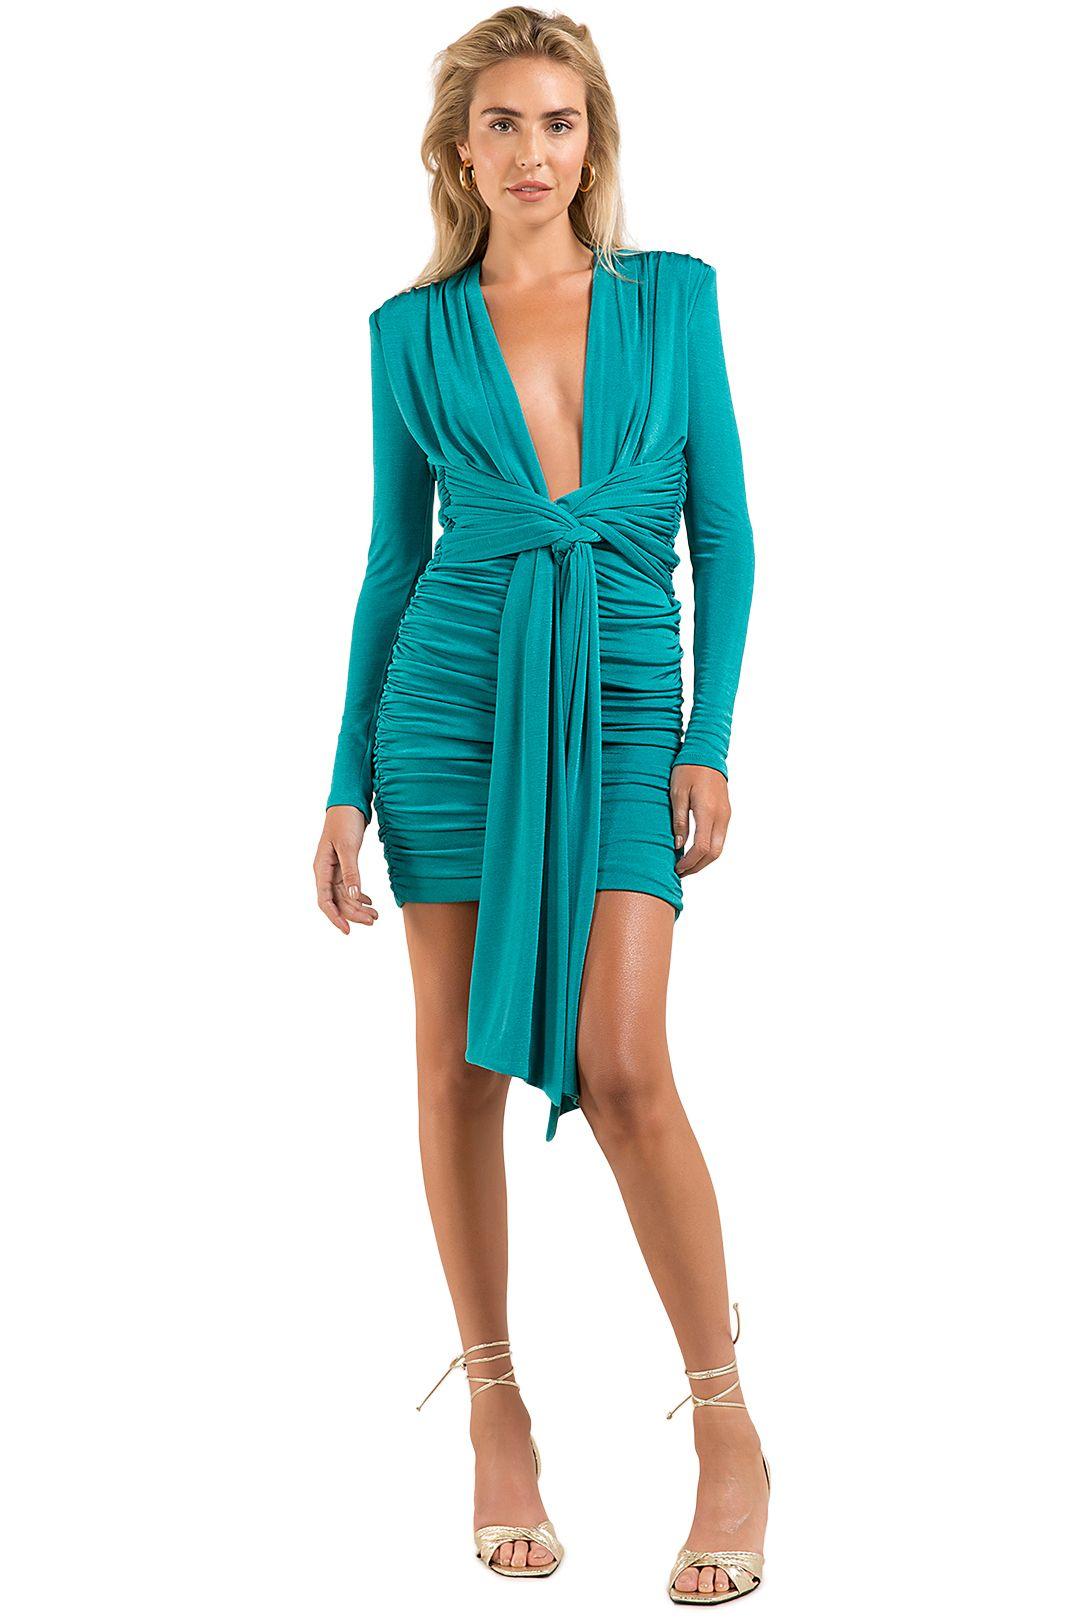 Misha-Paola-Dress-Emerald-Front